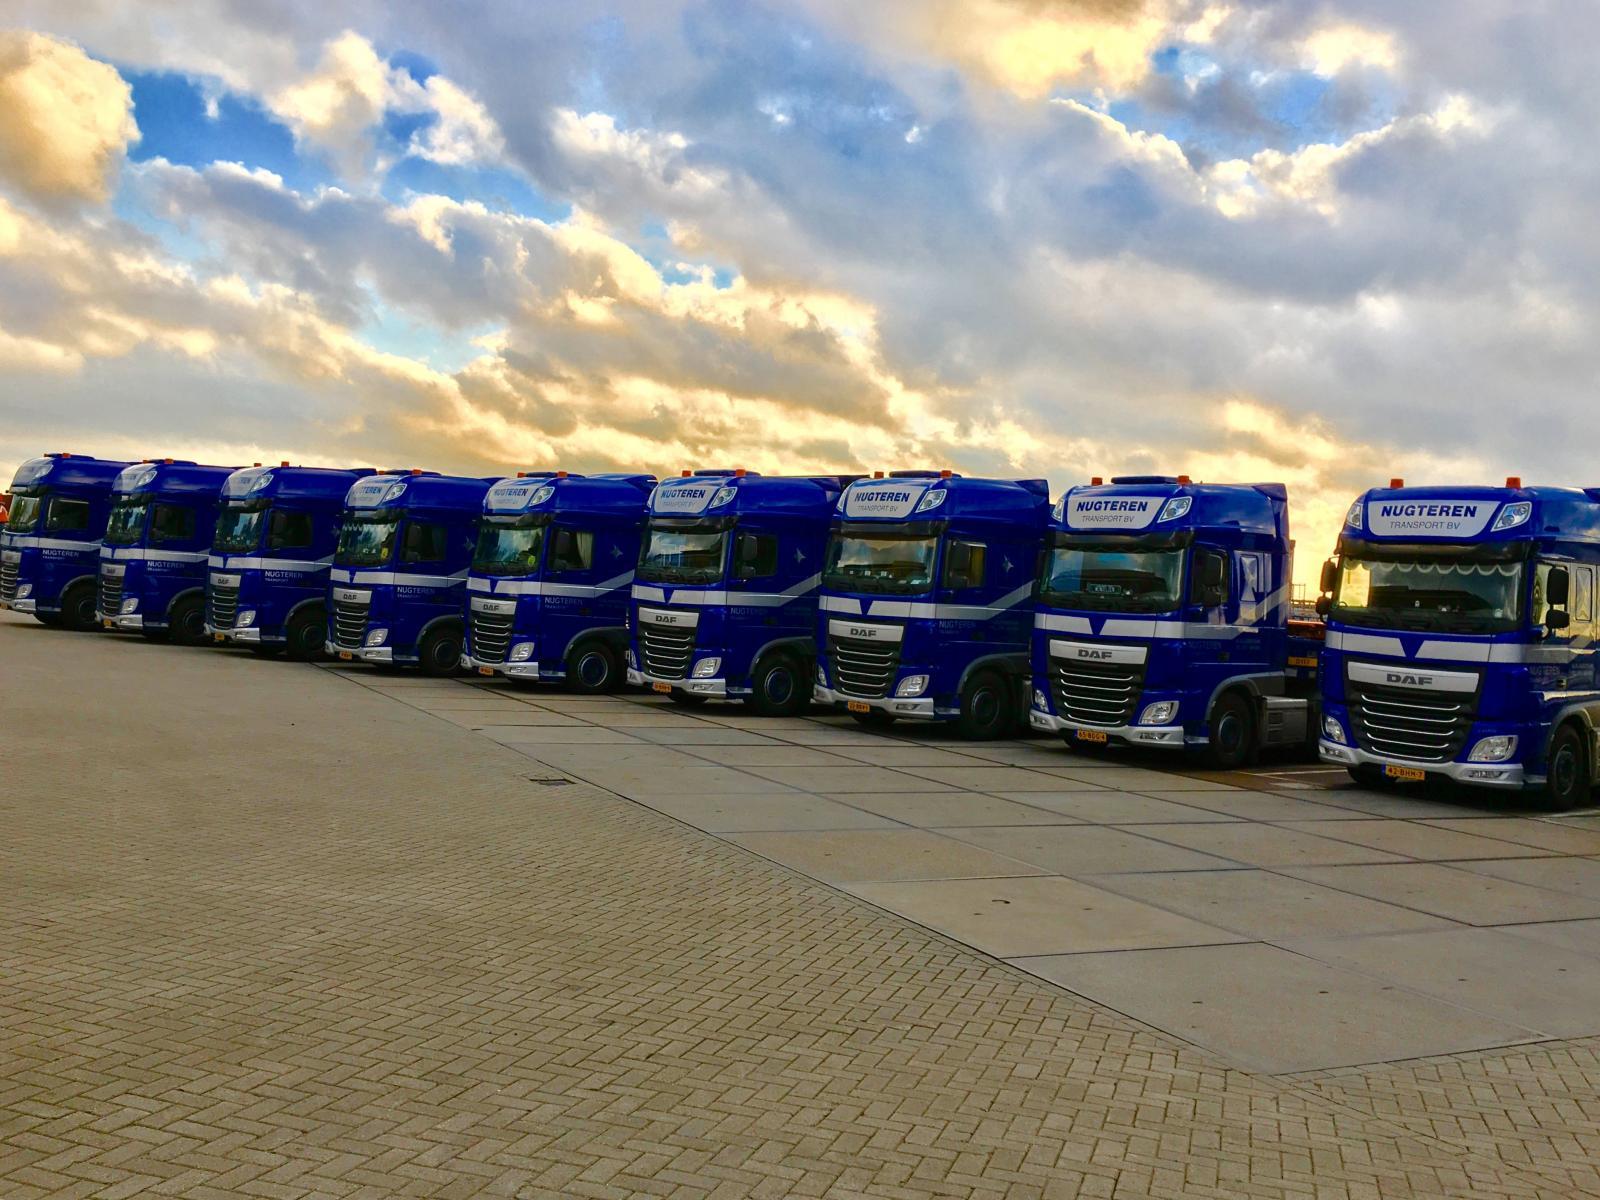 case id: 650, case title: Zuiniger rijden door trucksoftware